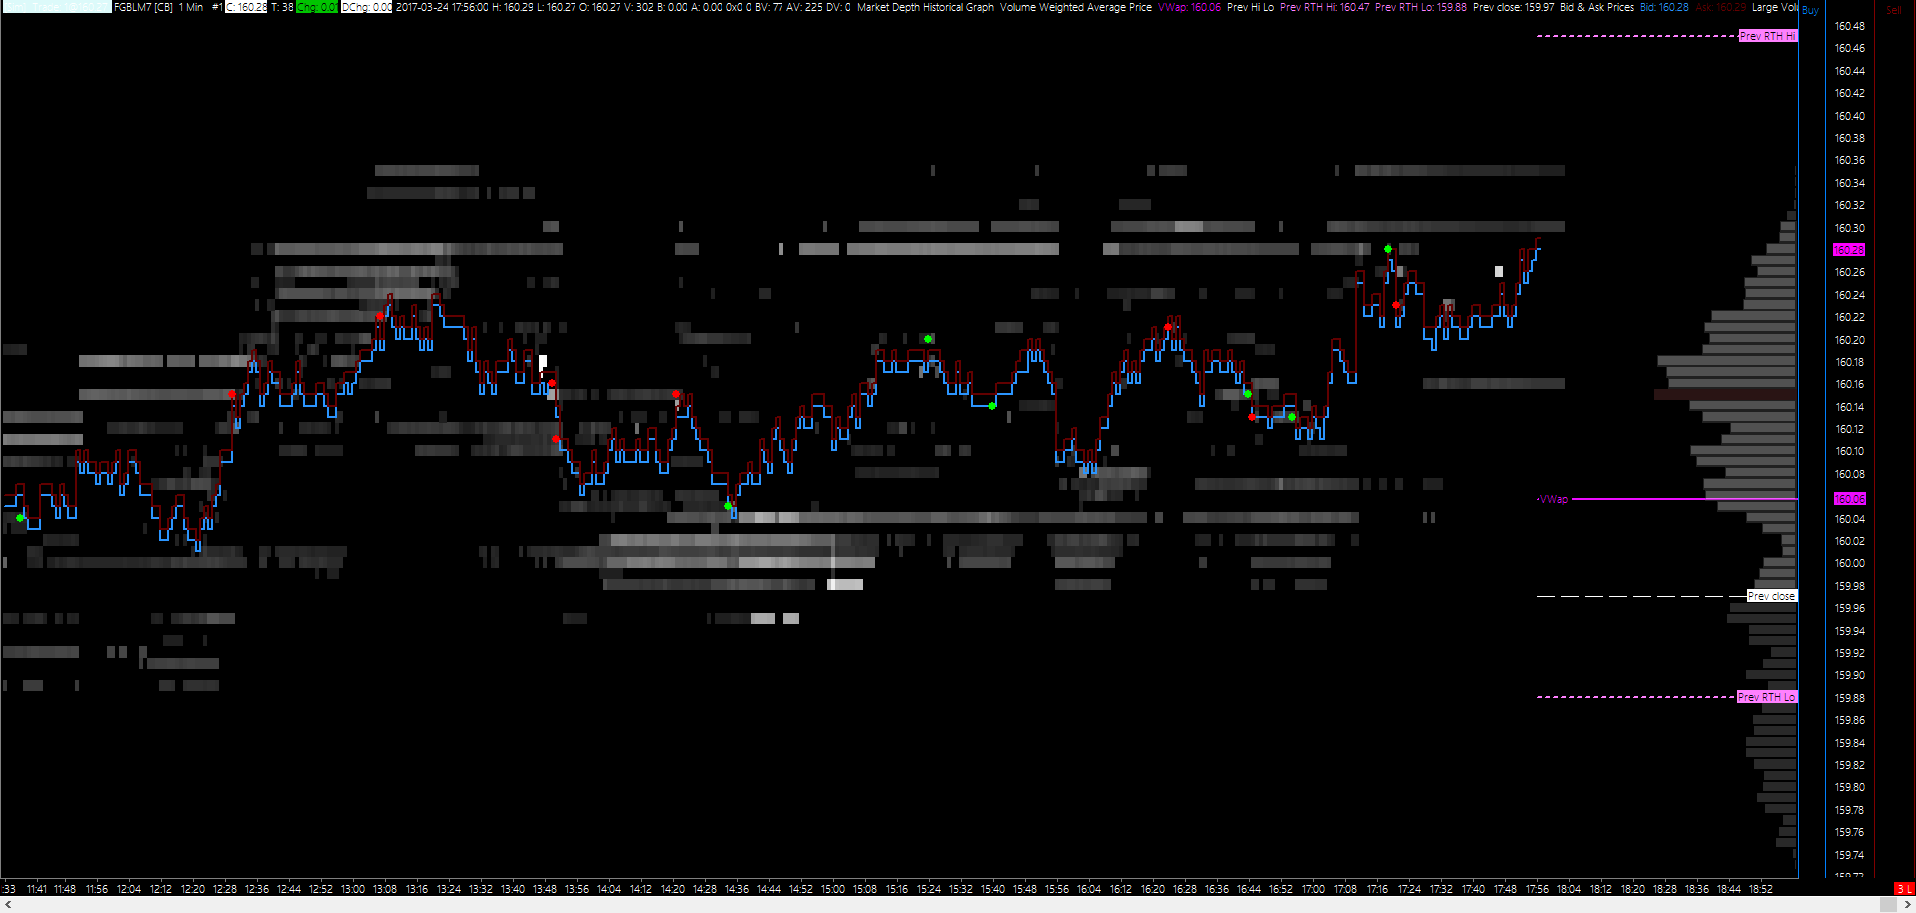 Sierra Chart Book Sharing Market Depth Historical Graph